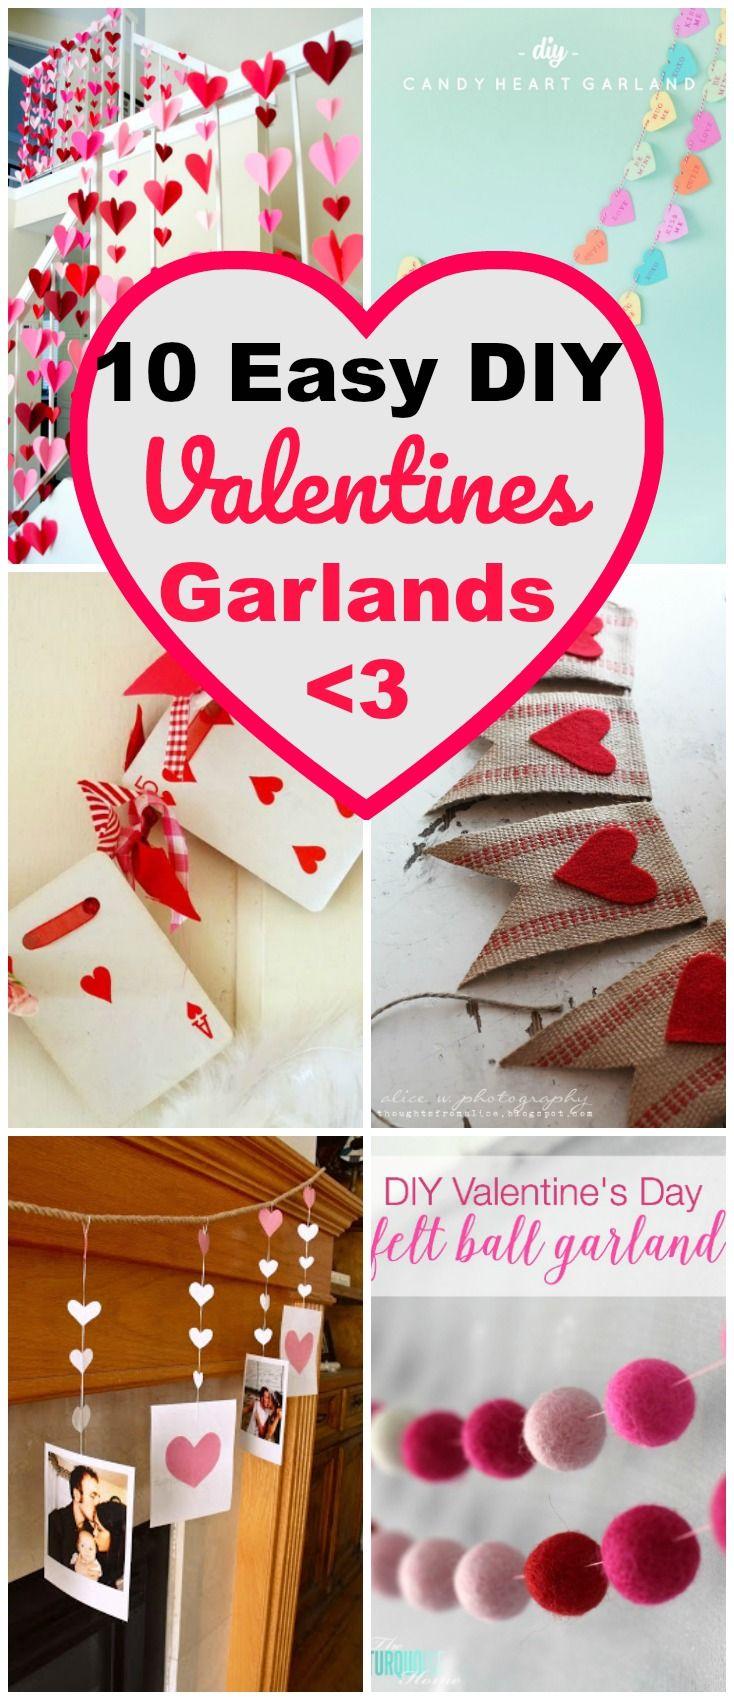 Valentines day diy garlands easy garland wall art ideas for feb